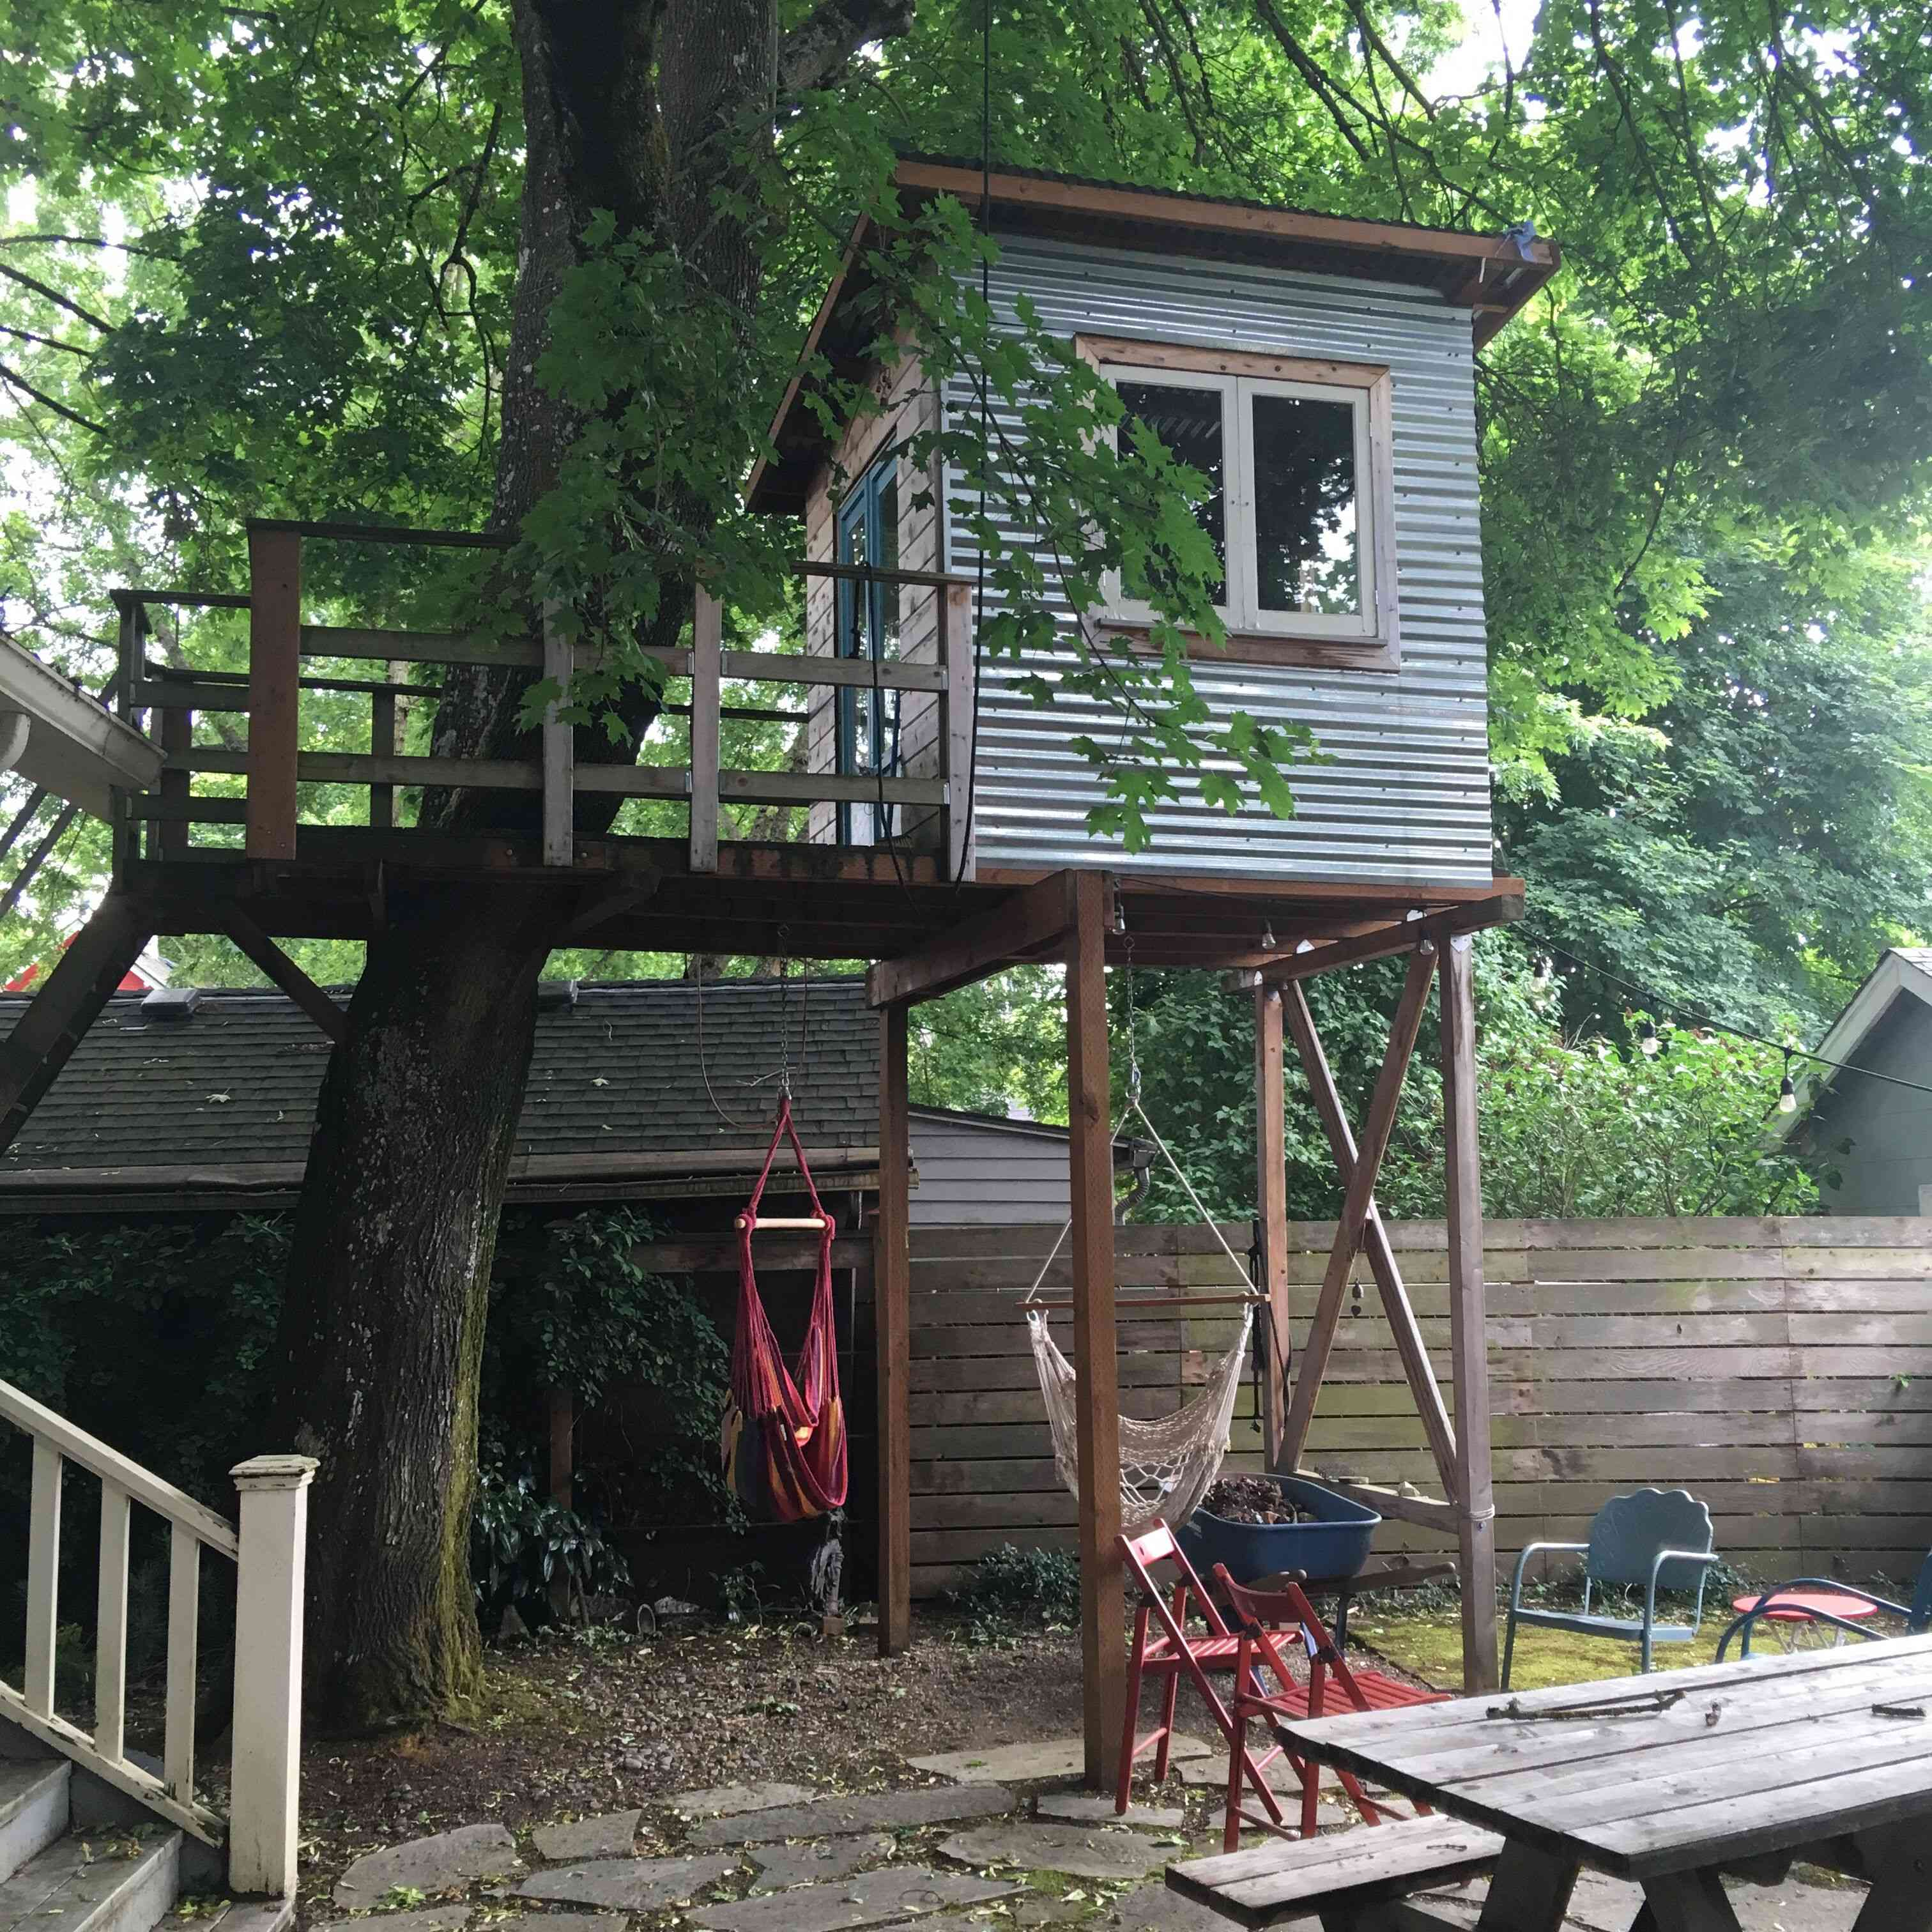 Tree house in the backyard